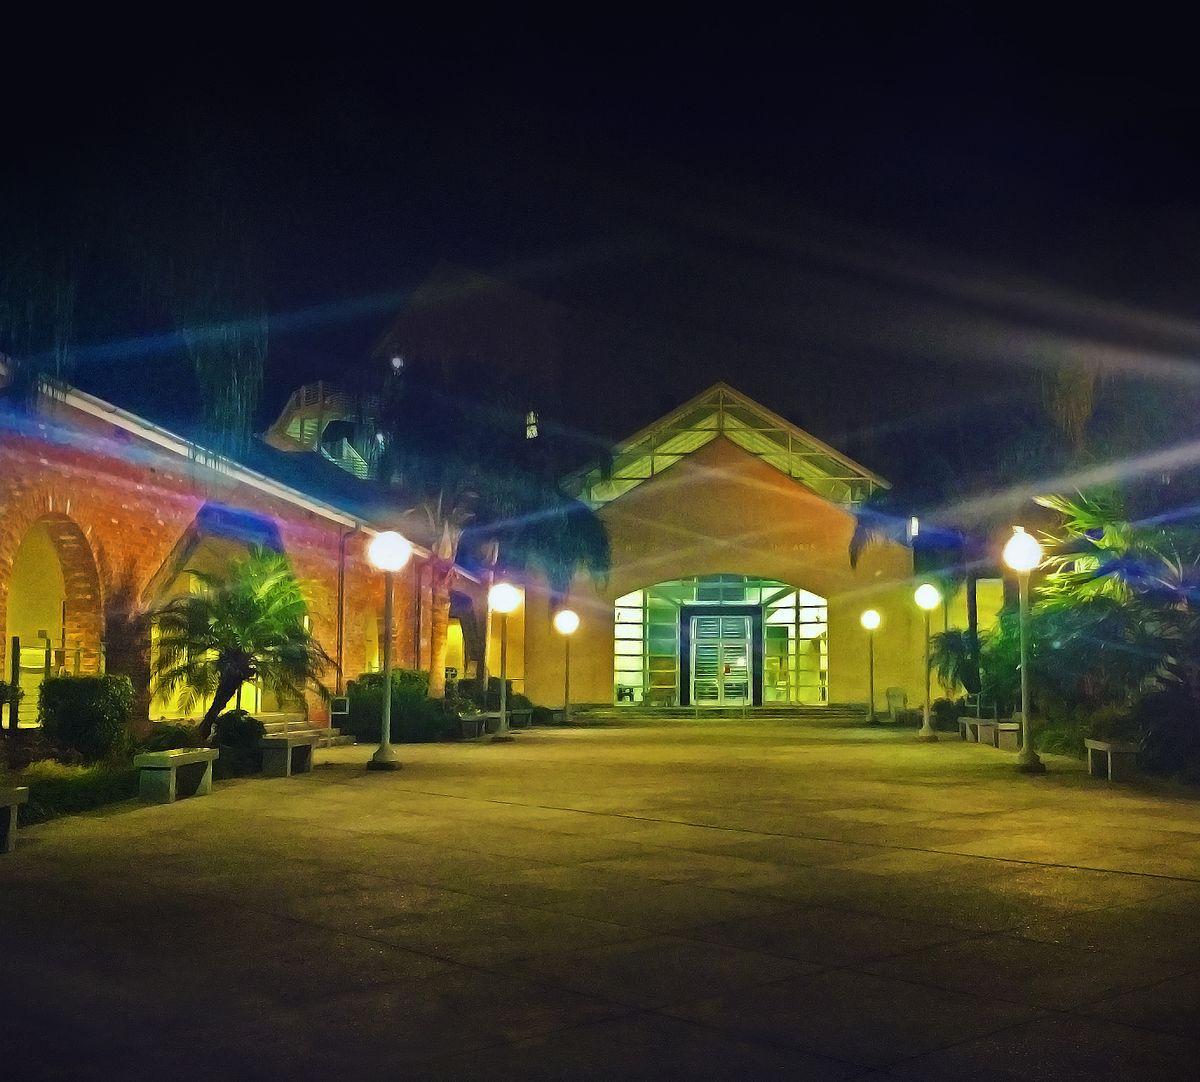 NOCCA_Campus_at_night.jpg